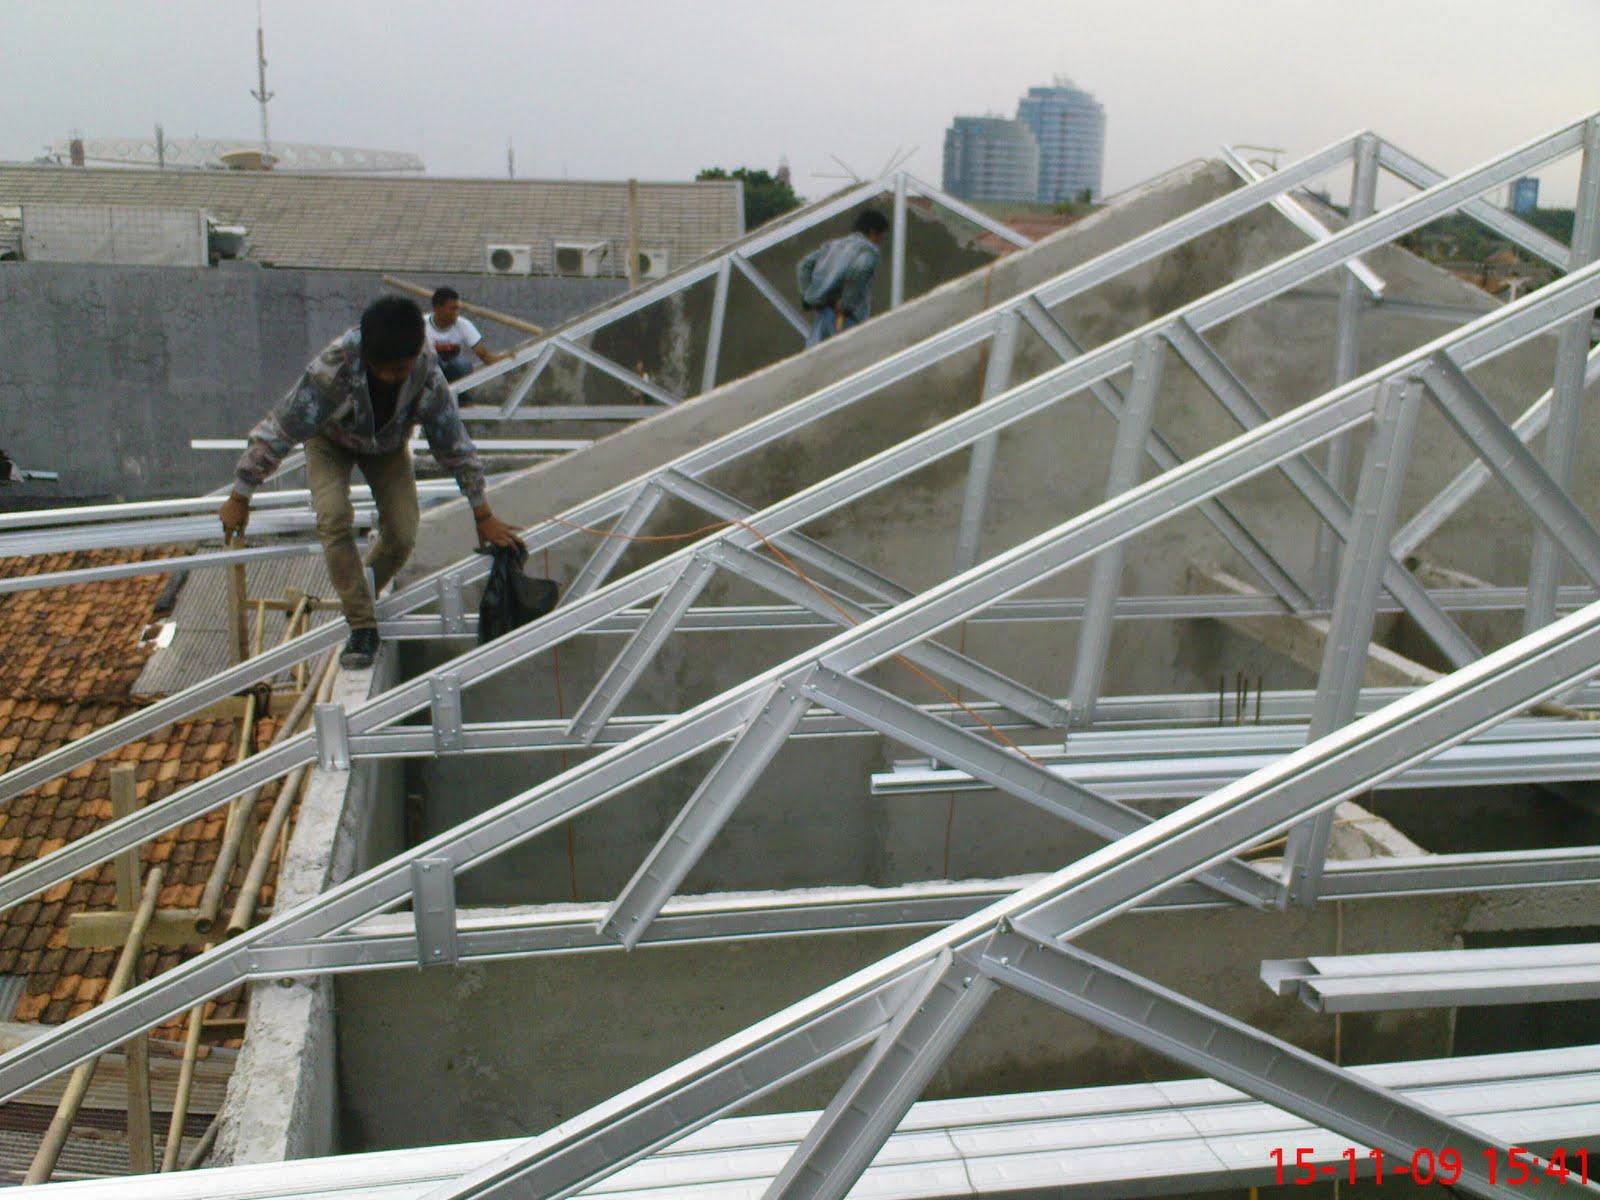 rangka atap baja ringan model limas inspiration 27 rumus kuda minimalist home